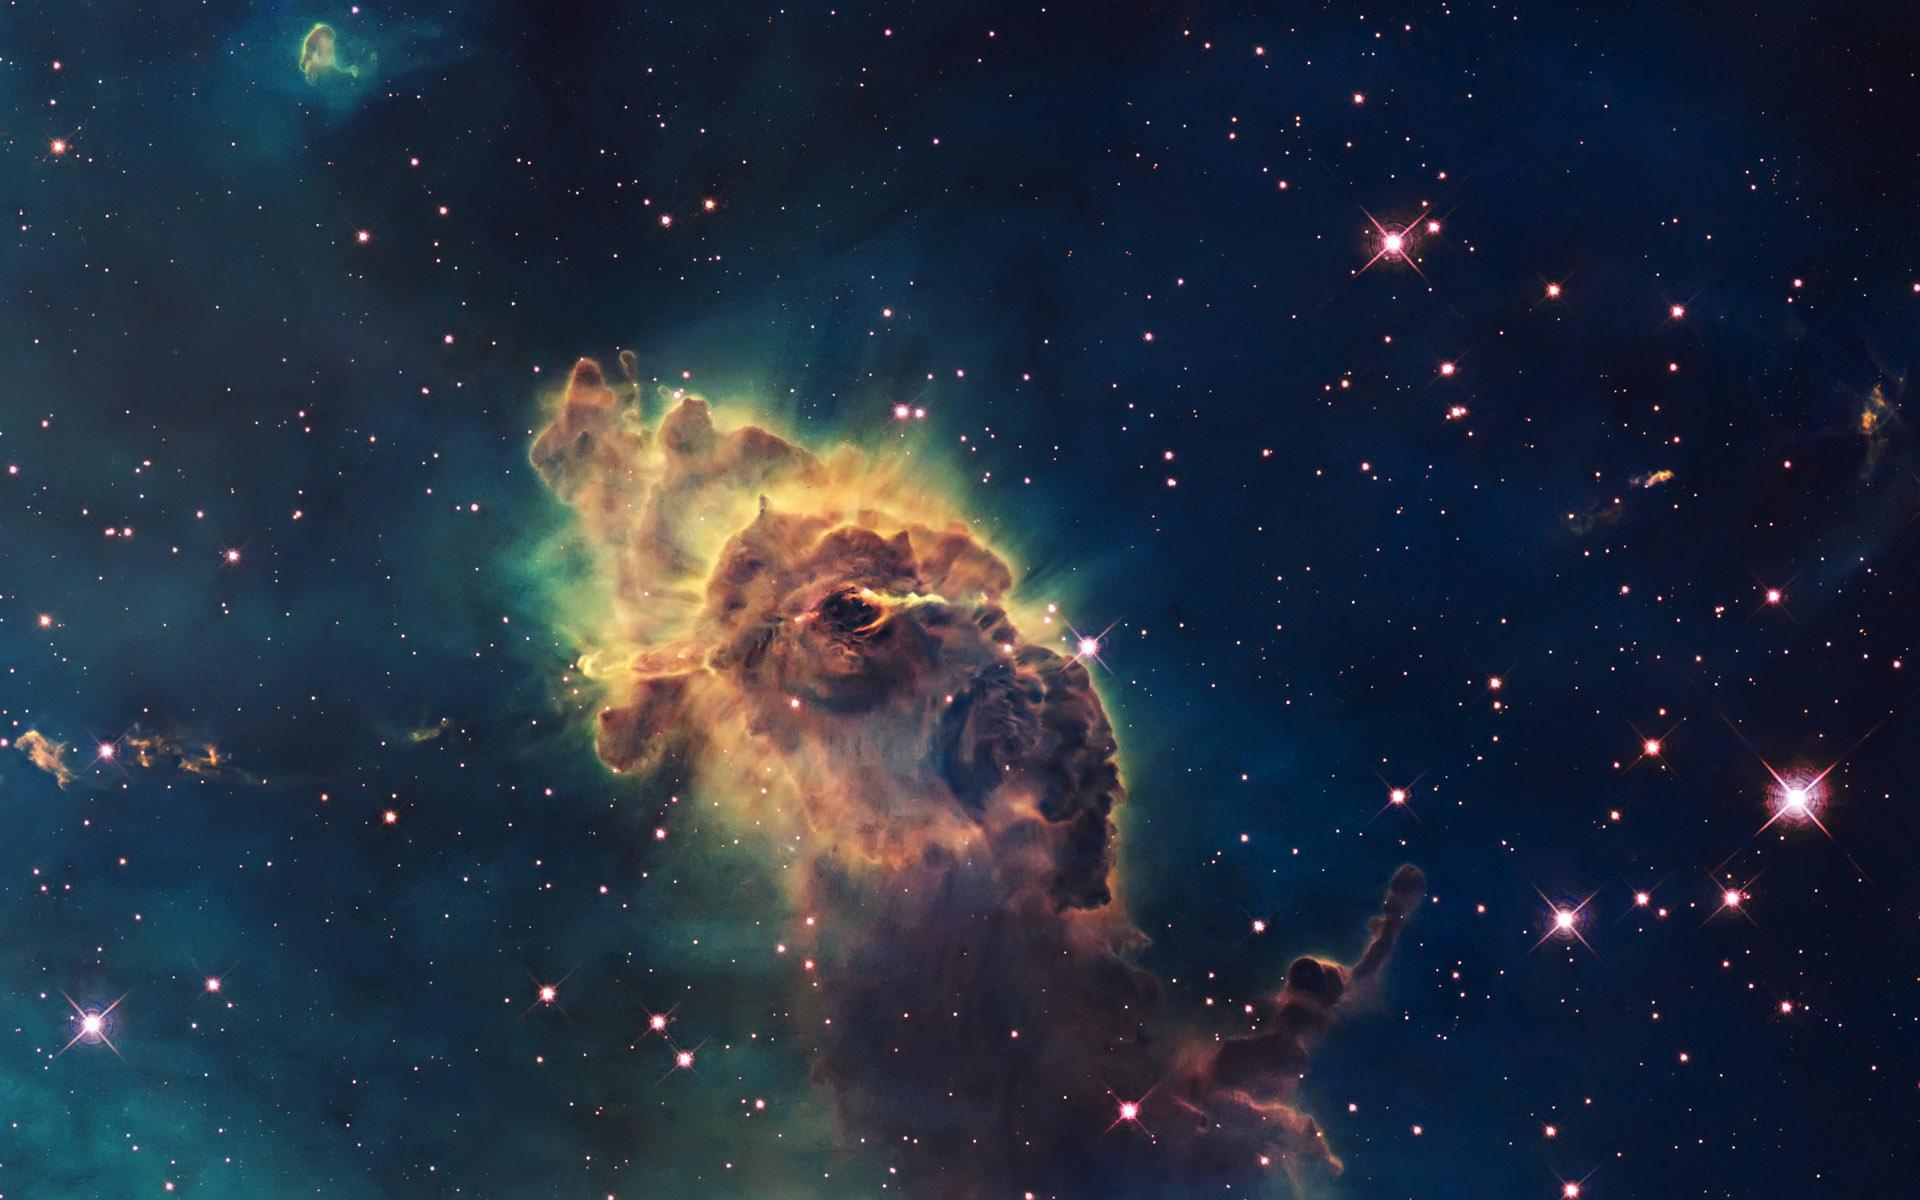 Spacespacenebula017804